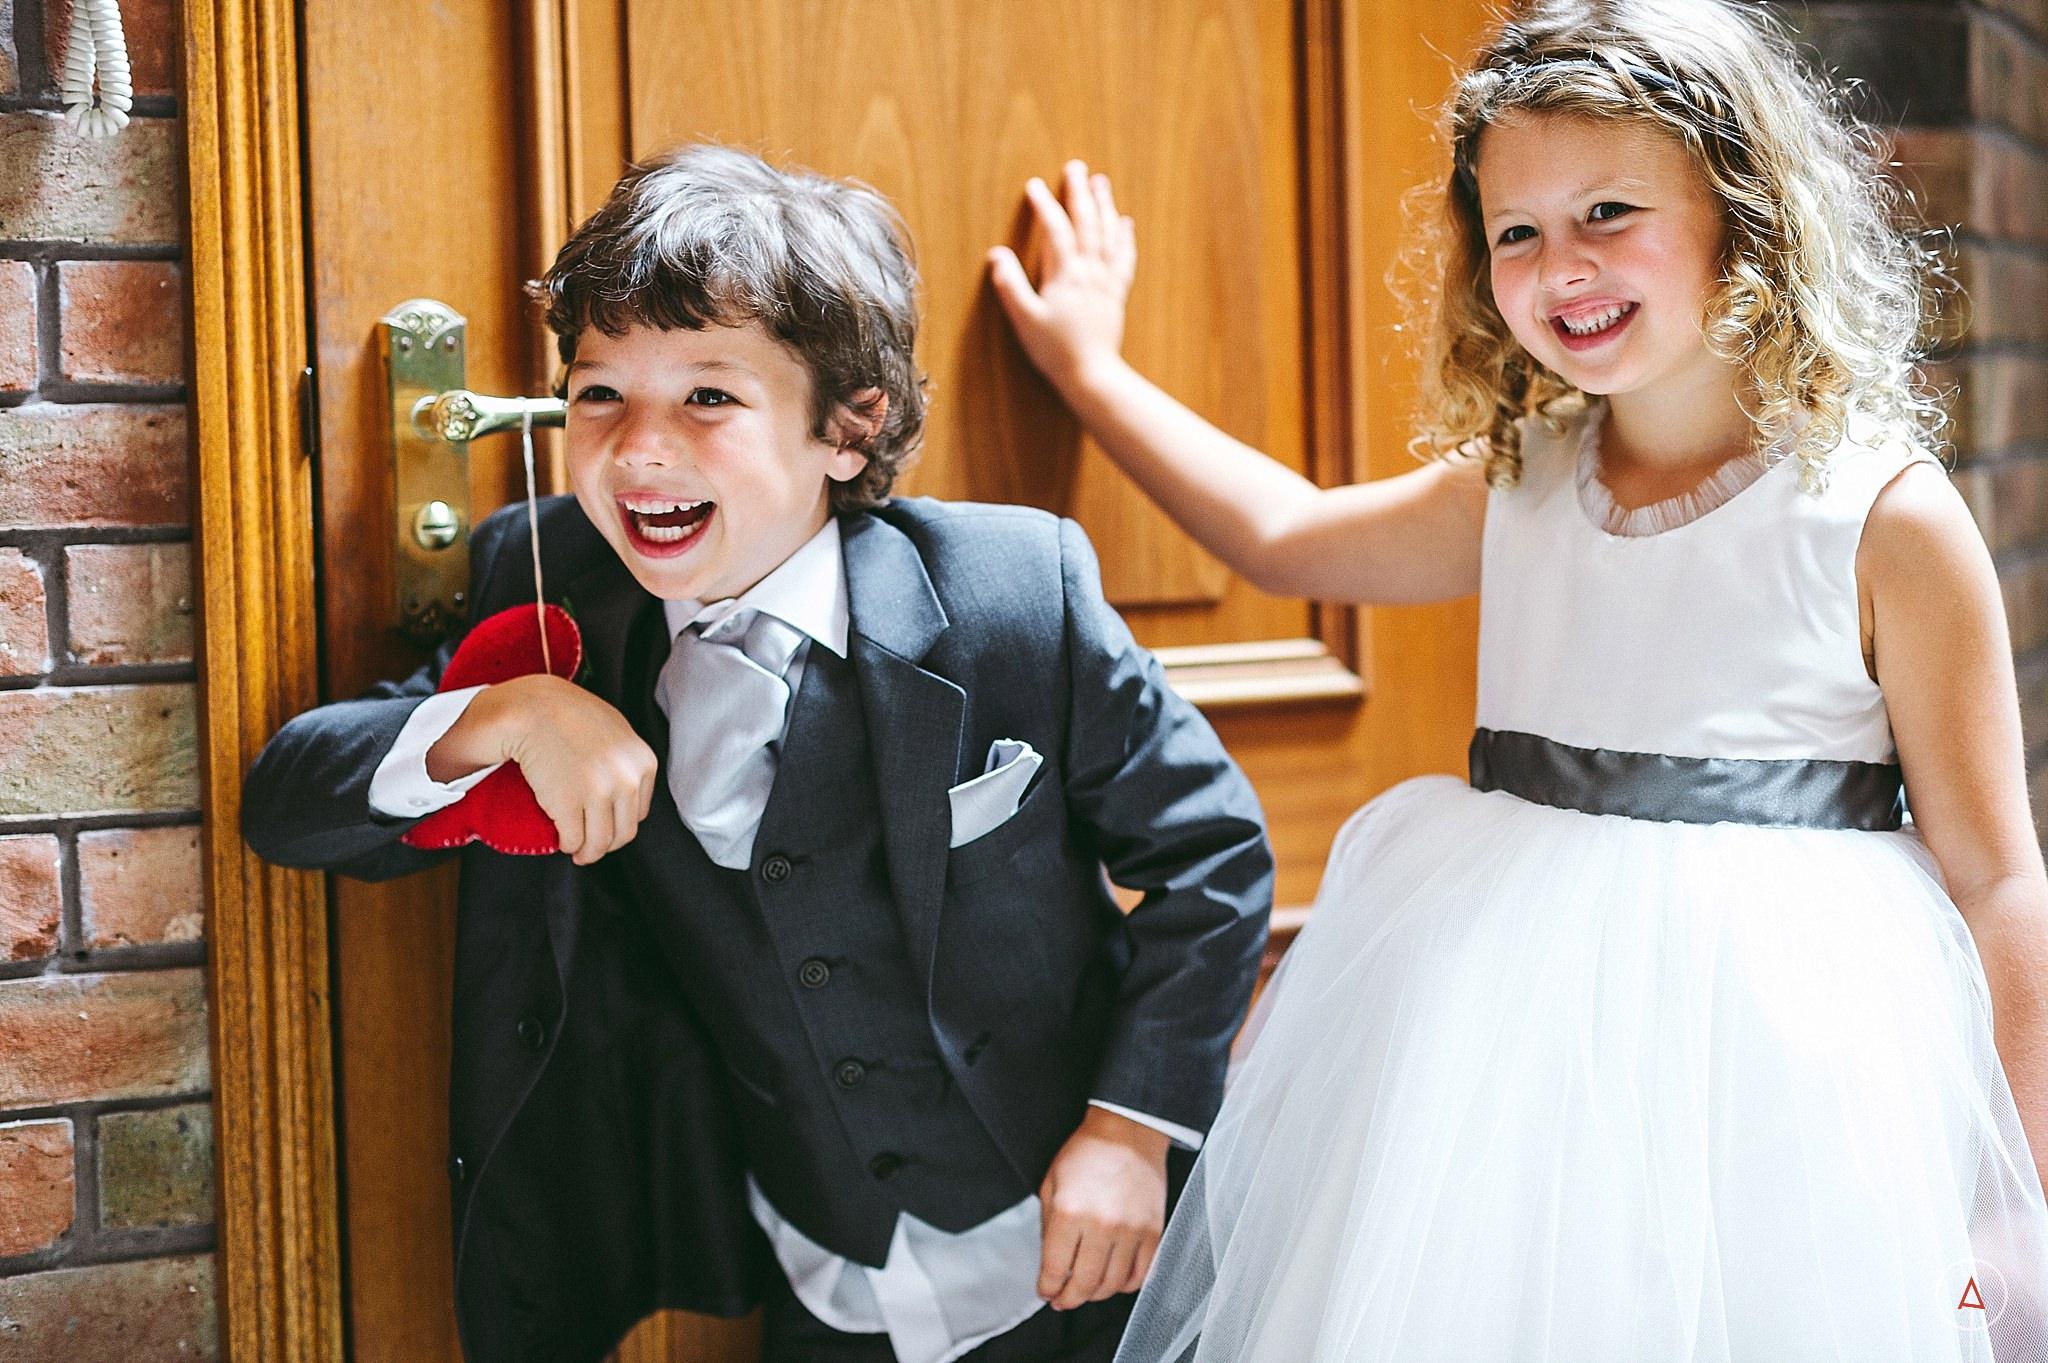 cardiff-wedding-photographer-aga-tomaszek_0352